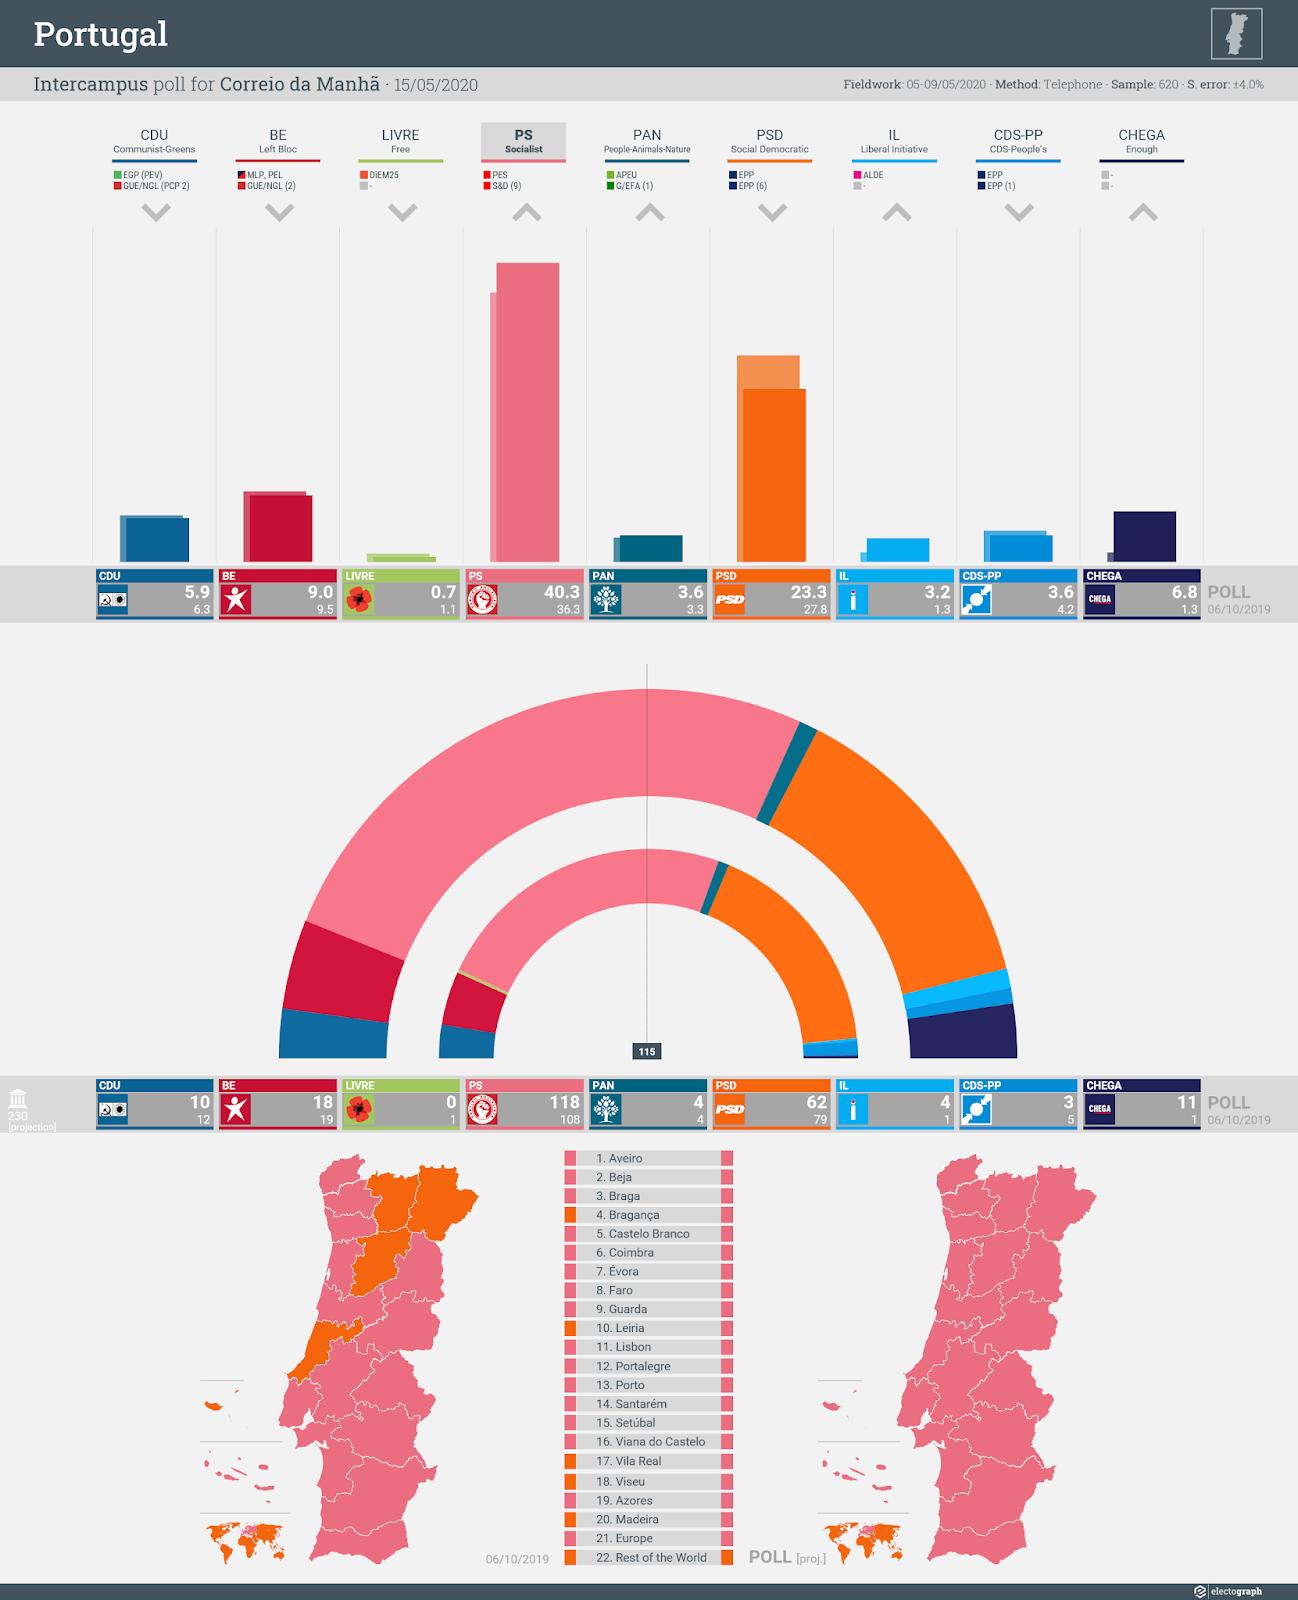 PORTUGAL: Intercampus poll chart for Correio da Manhã, 15 May 2020